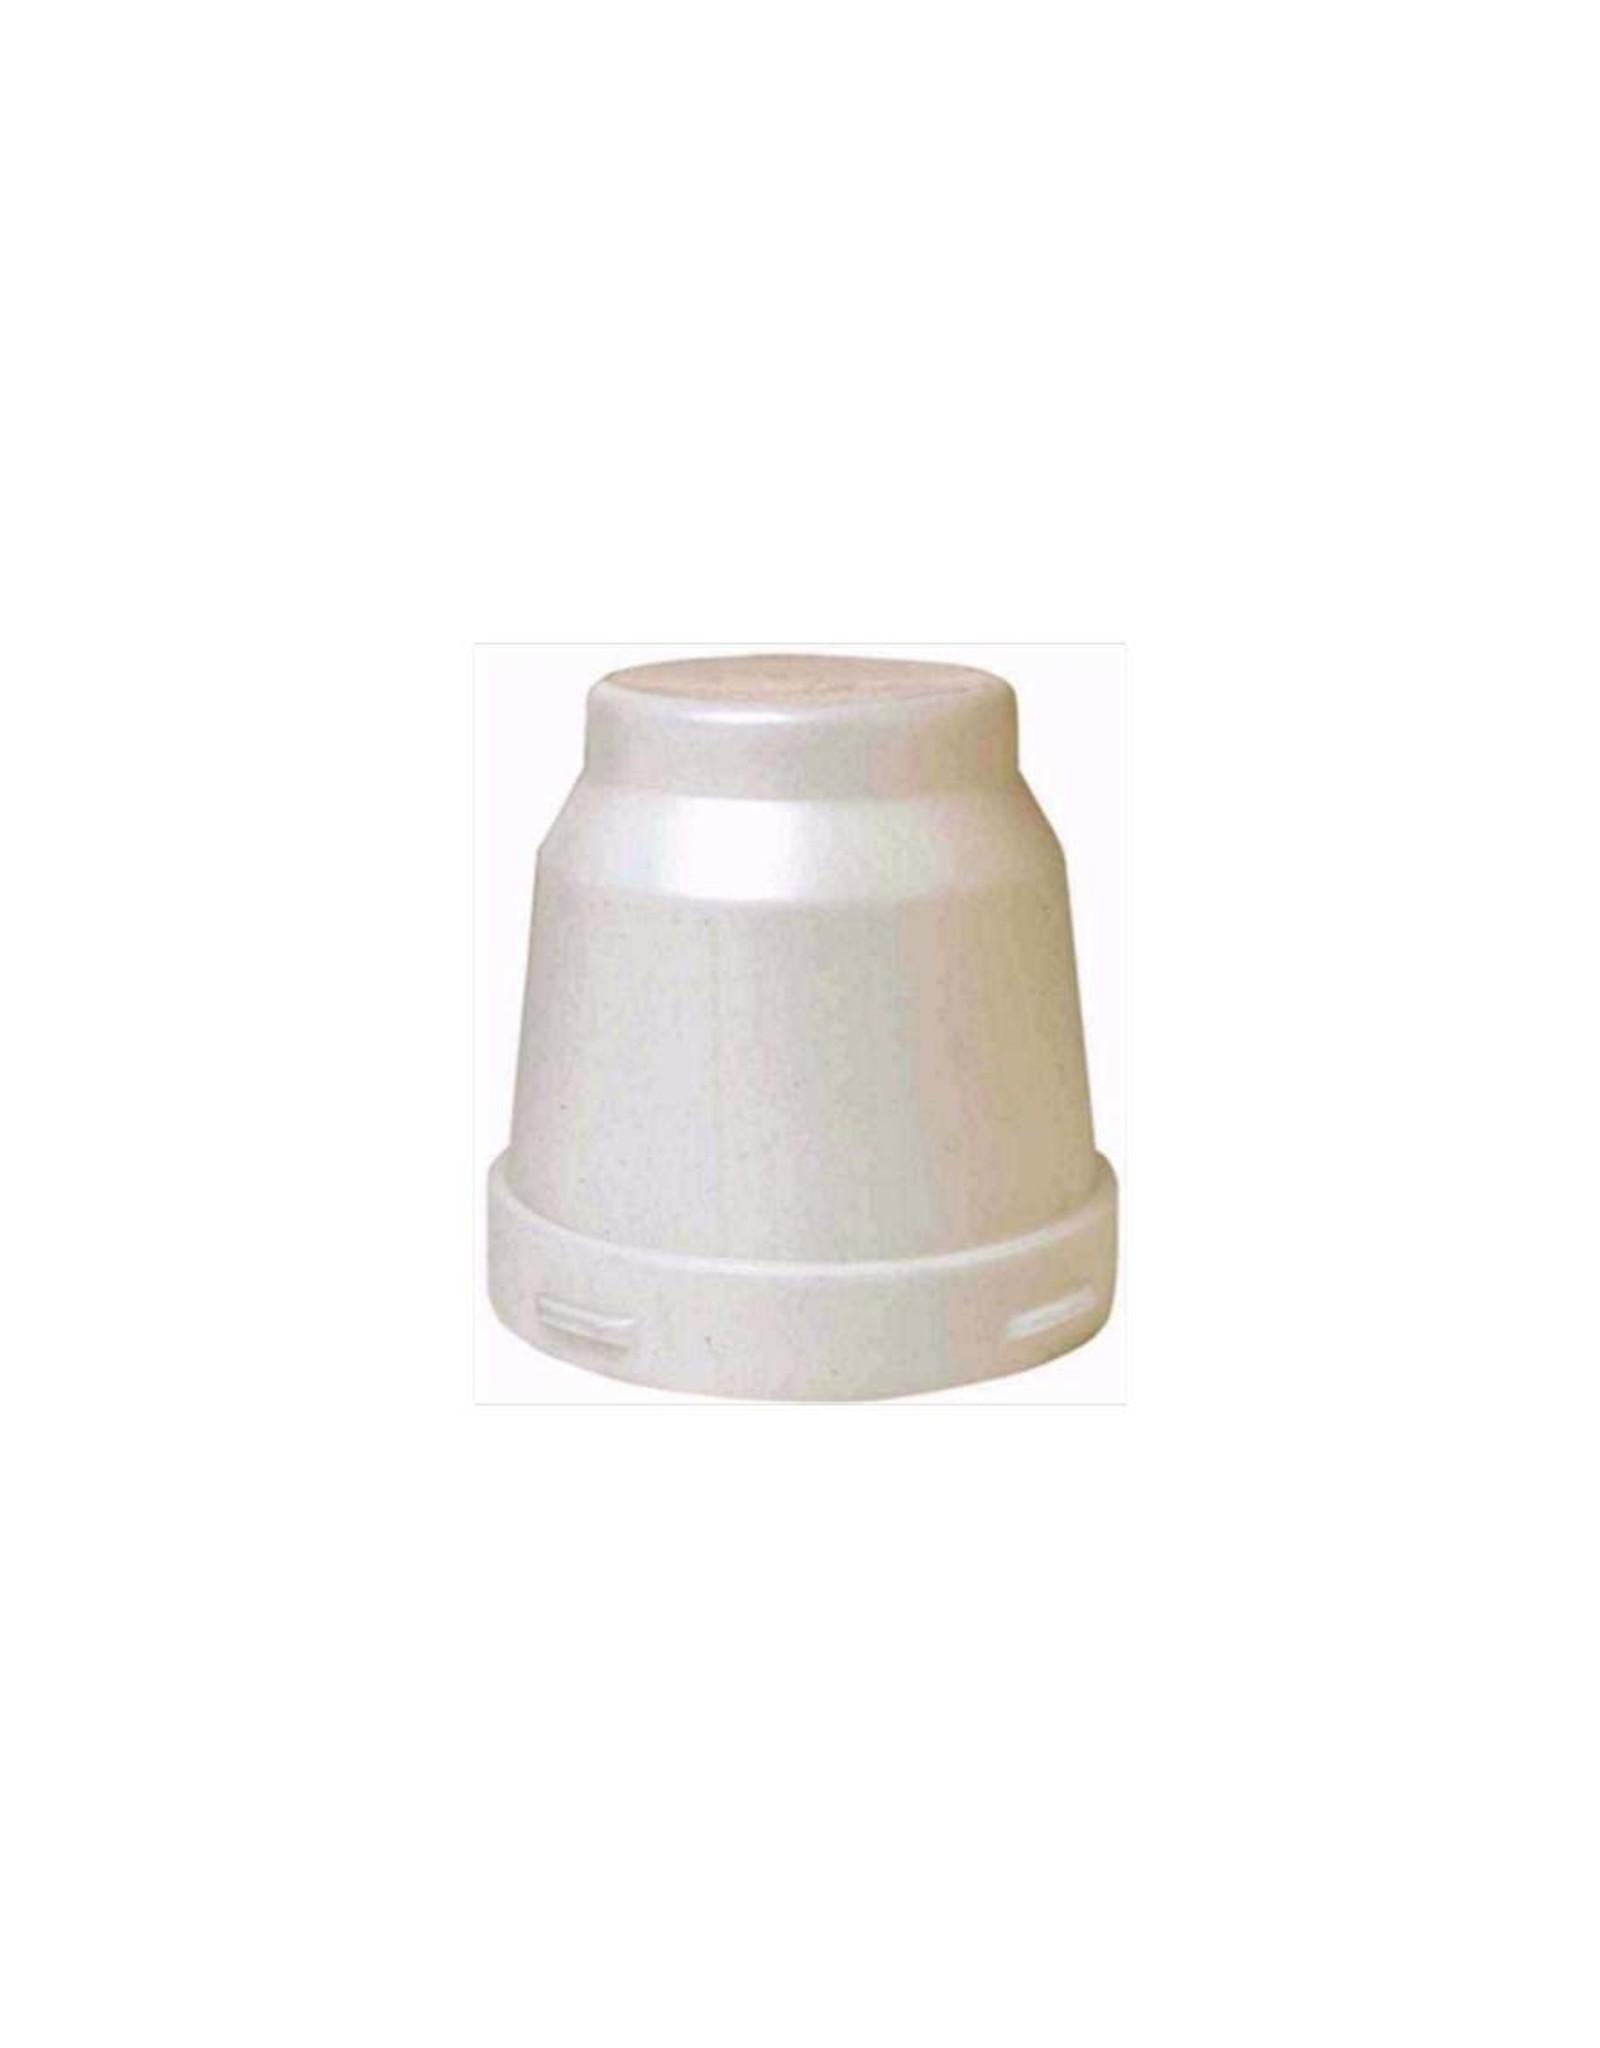 Little Giant Plastic Poultry Jar 1 GAL